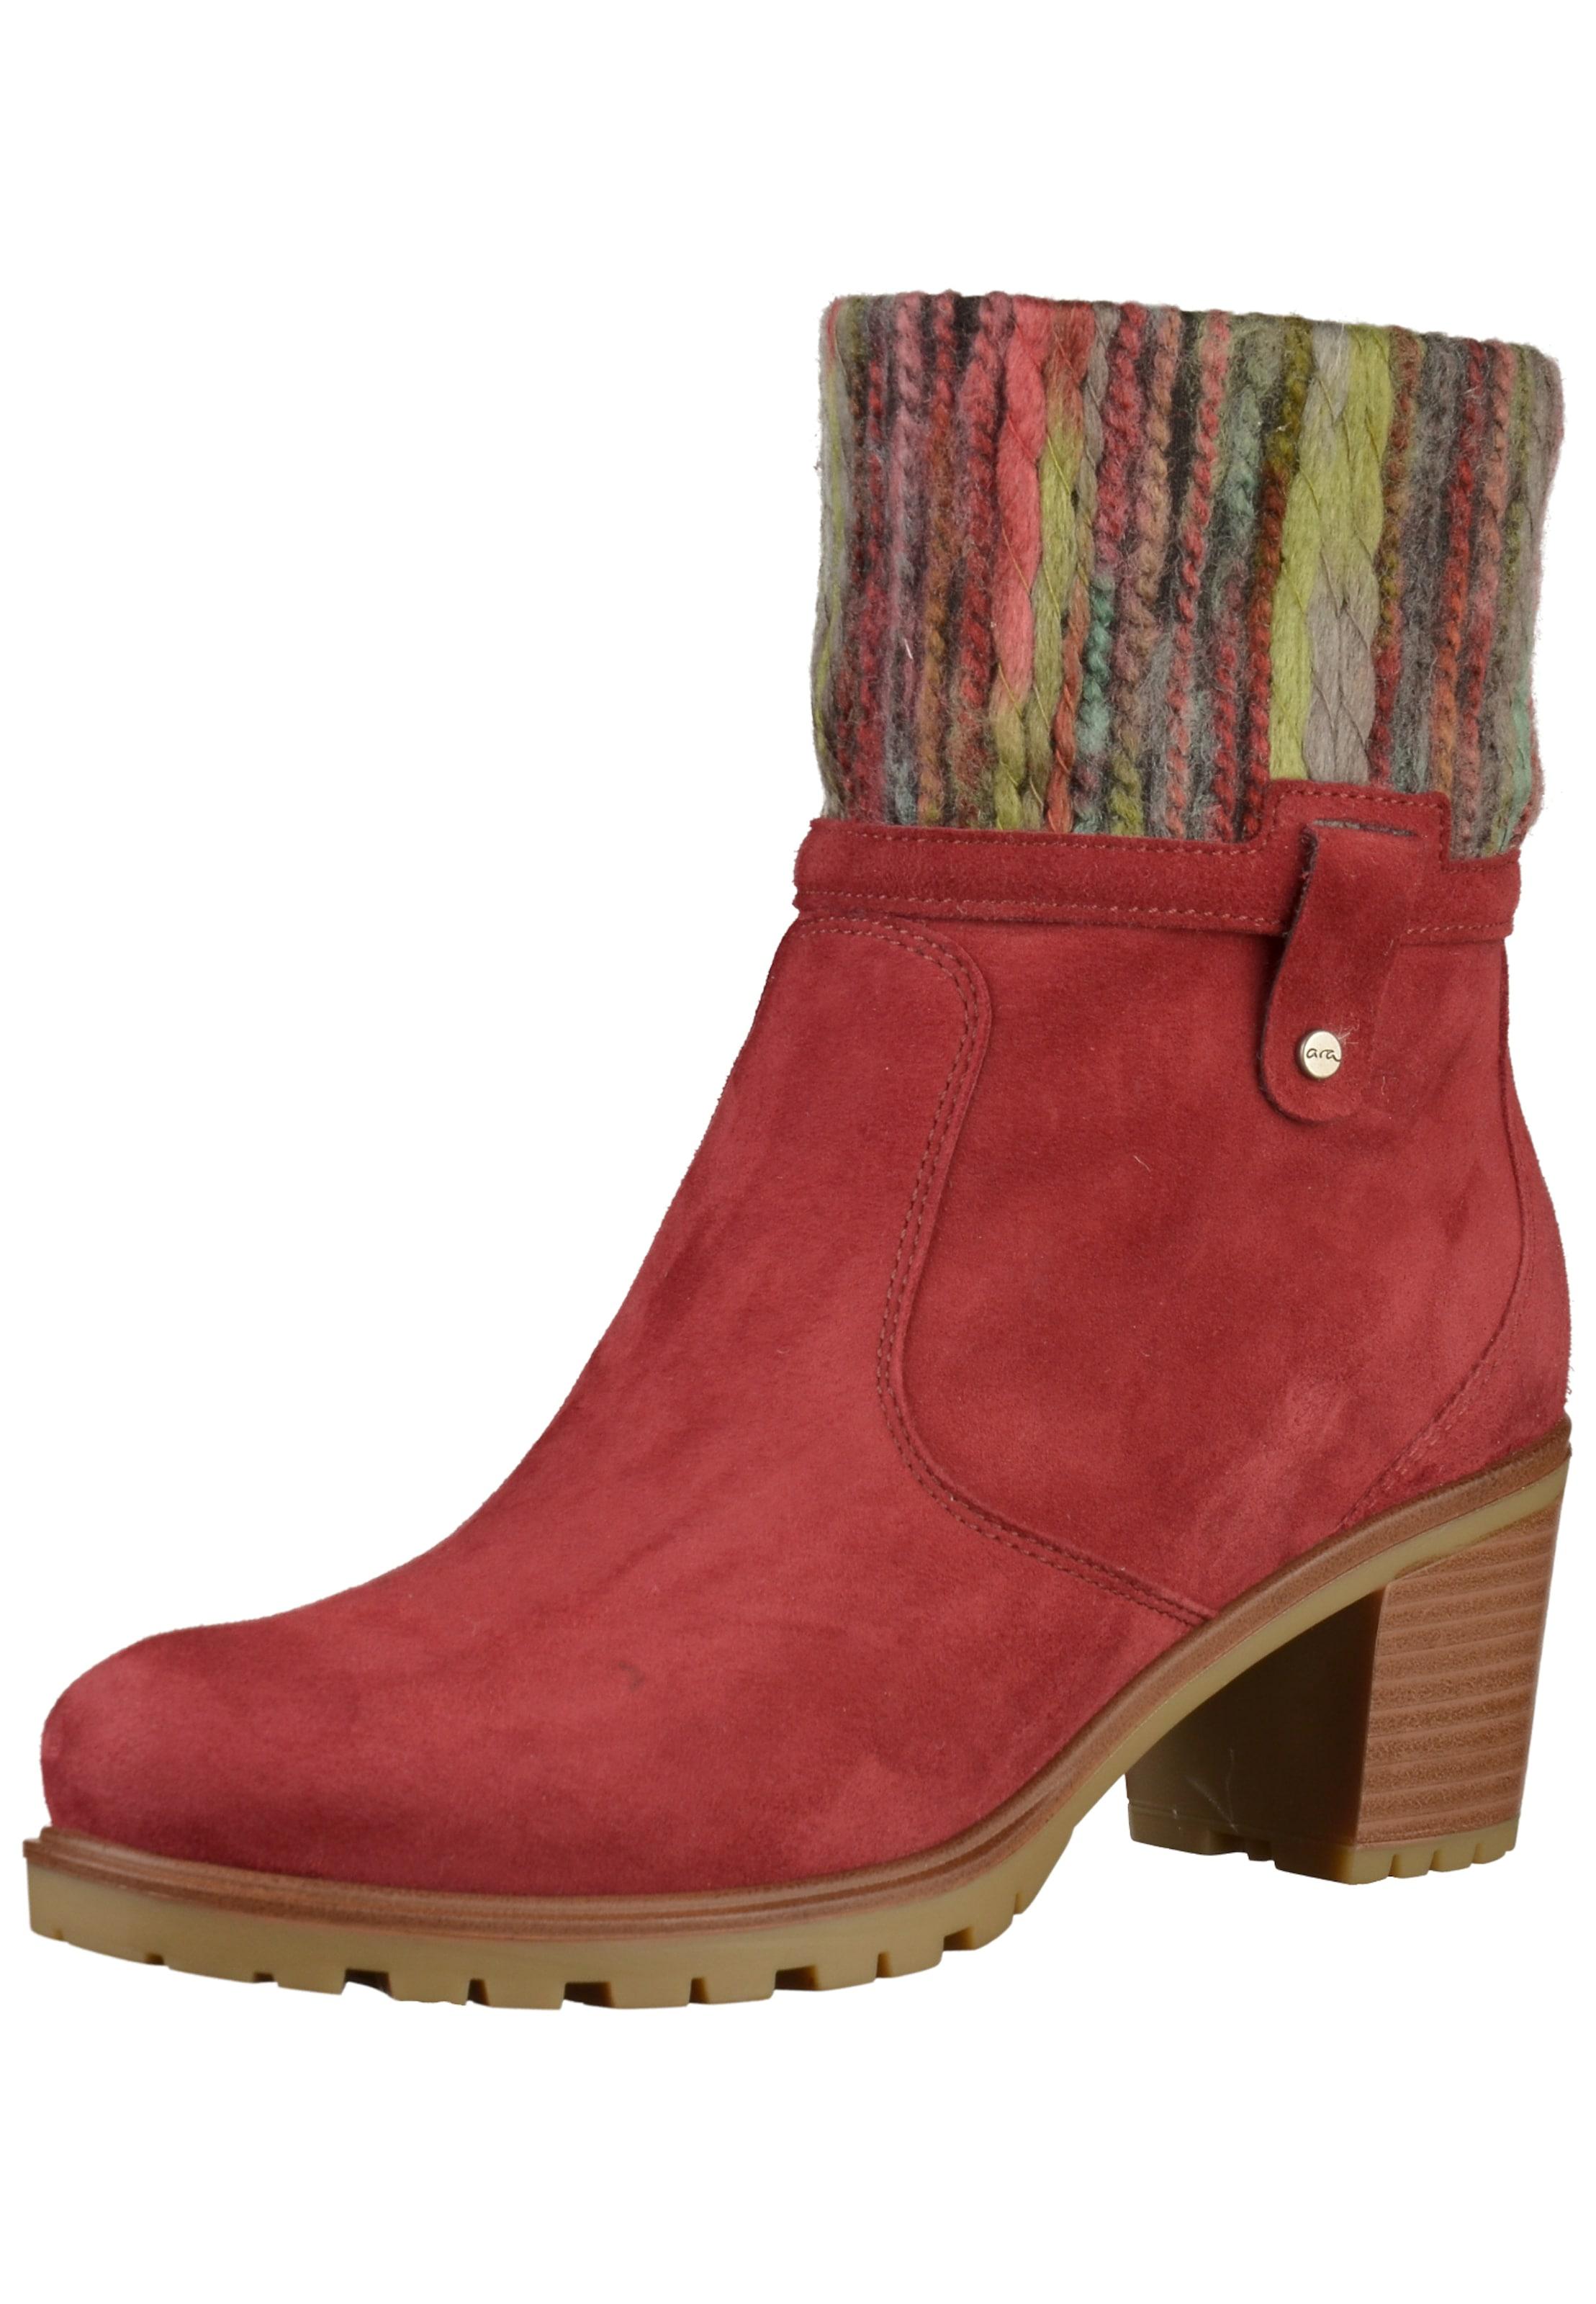 Jenny Stiefel in mischfarben   rot